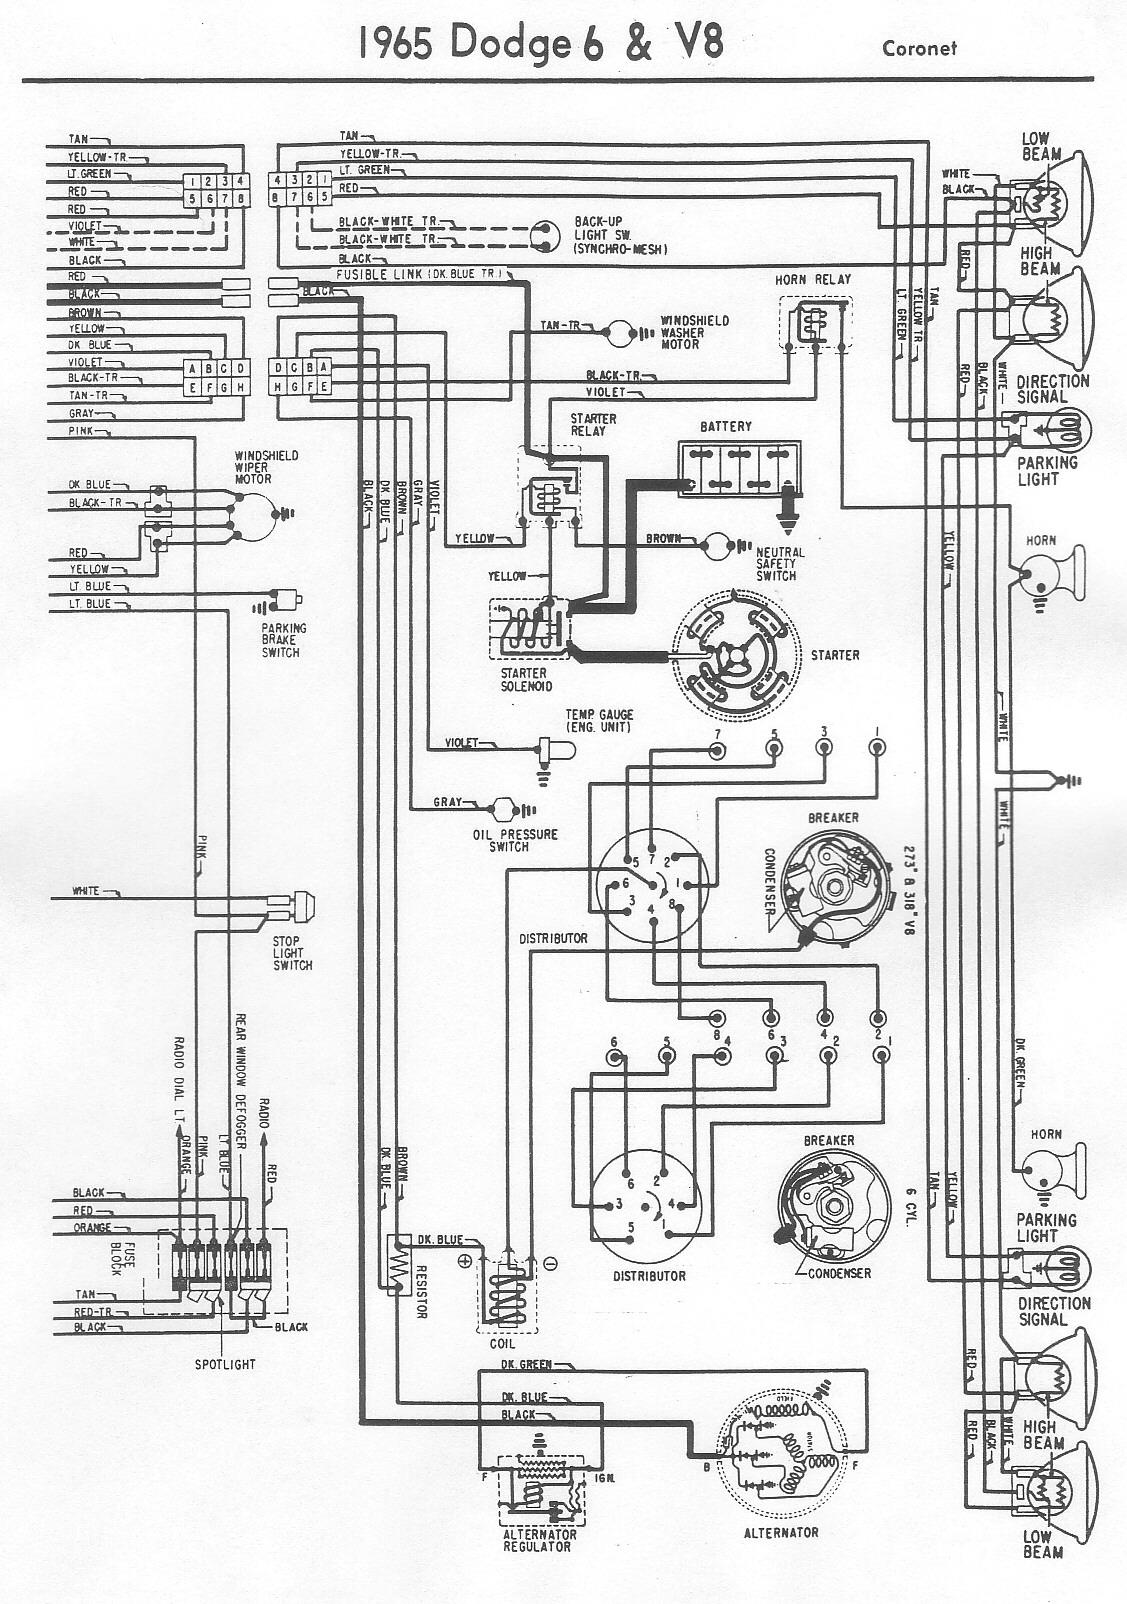 small resolution of 1967 dodge alternator wiring wiring diagrams source67 dodge ignition wiring diagram automotive wiring diagrams dodge caravan